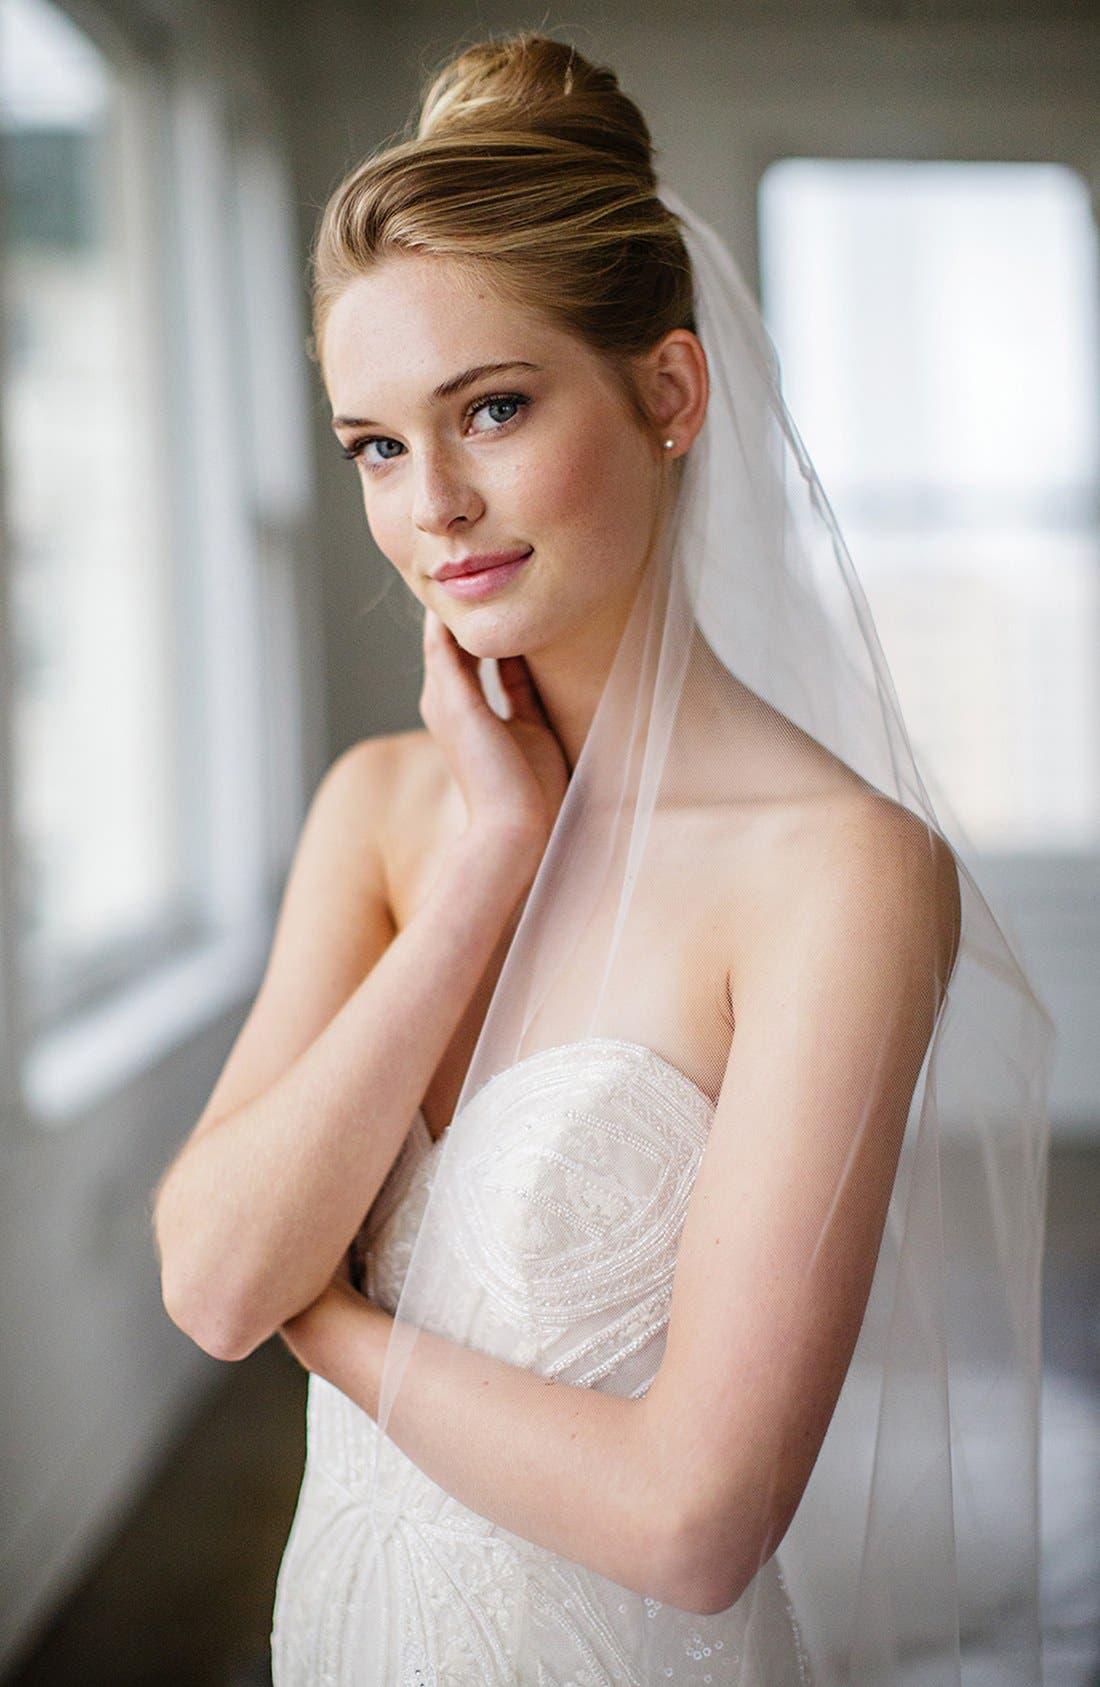 Alternate Image 2  - Brides & Hairpins 'Christina' Tulle Veil